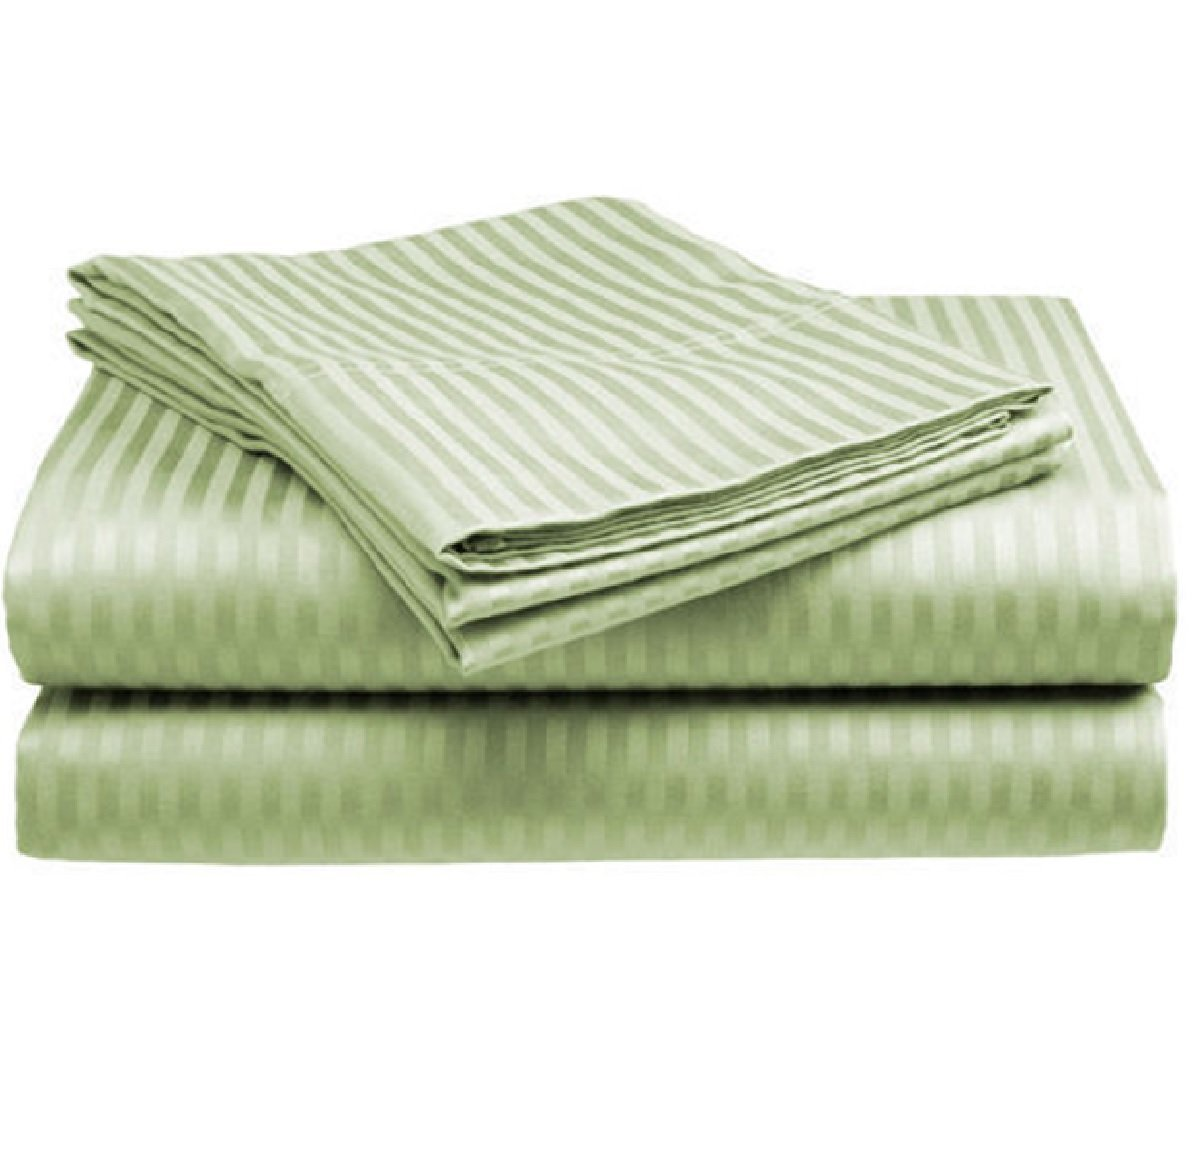 Amazon.com: QUEEN SIZE 1500 Thread Count STRIPED Sheet Set, SAGE: Home &  Kitchen